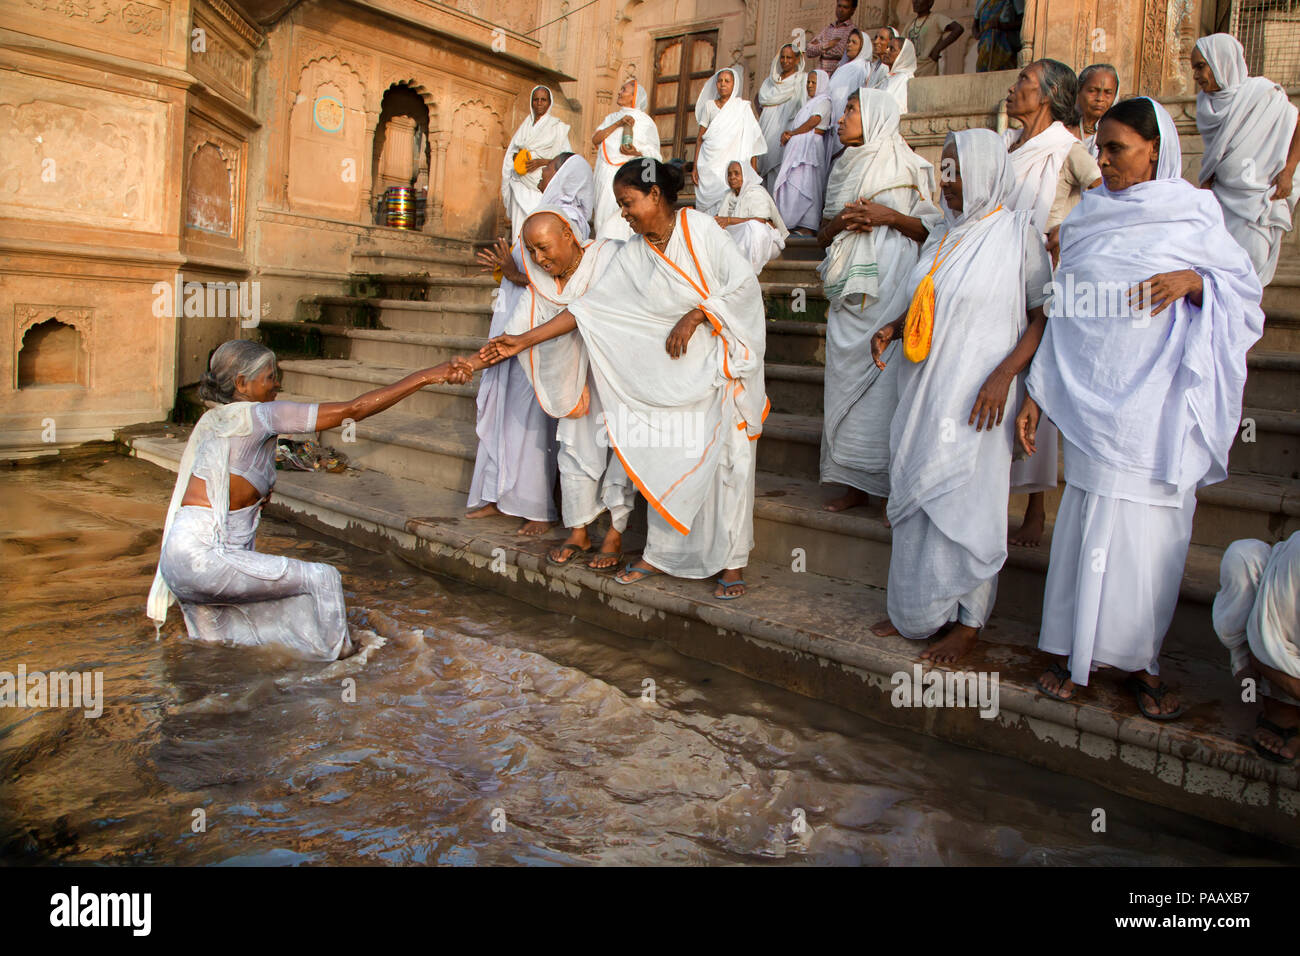 Indiano vedove indù sulle rive del fiume Yamuna in Vrindavan , India Foto Stock